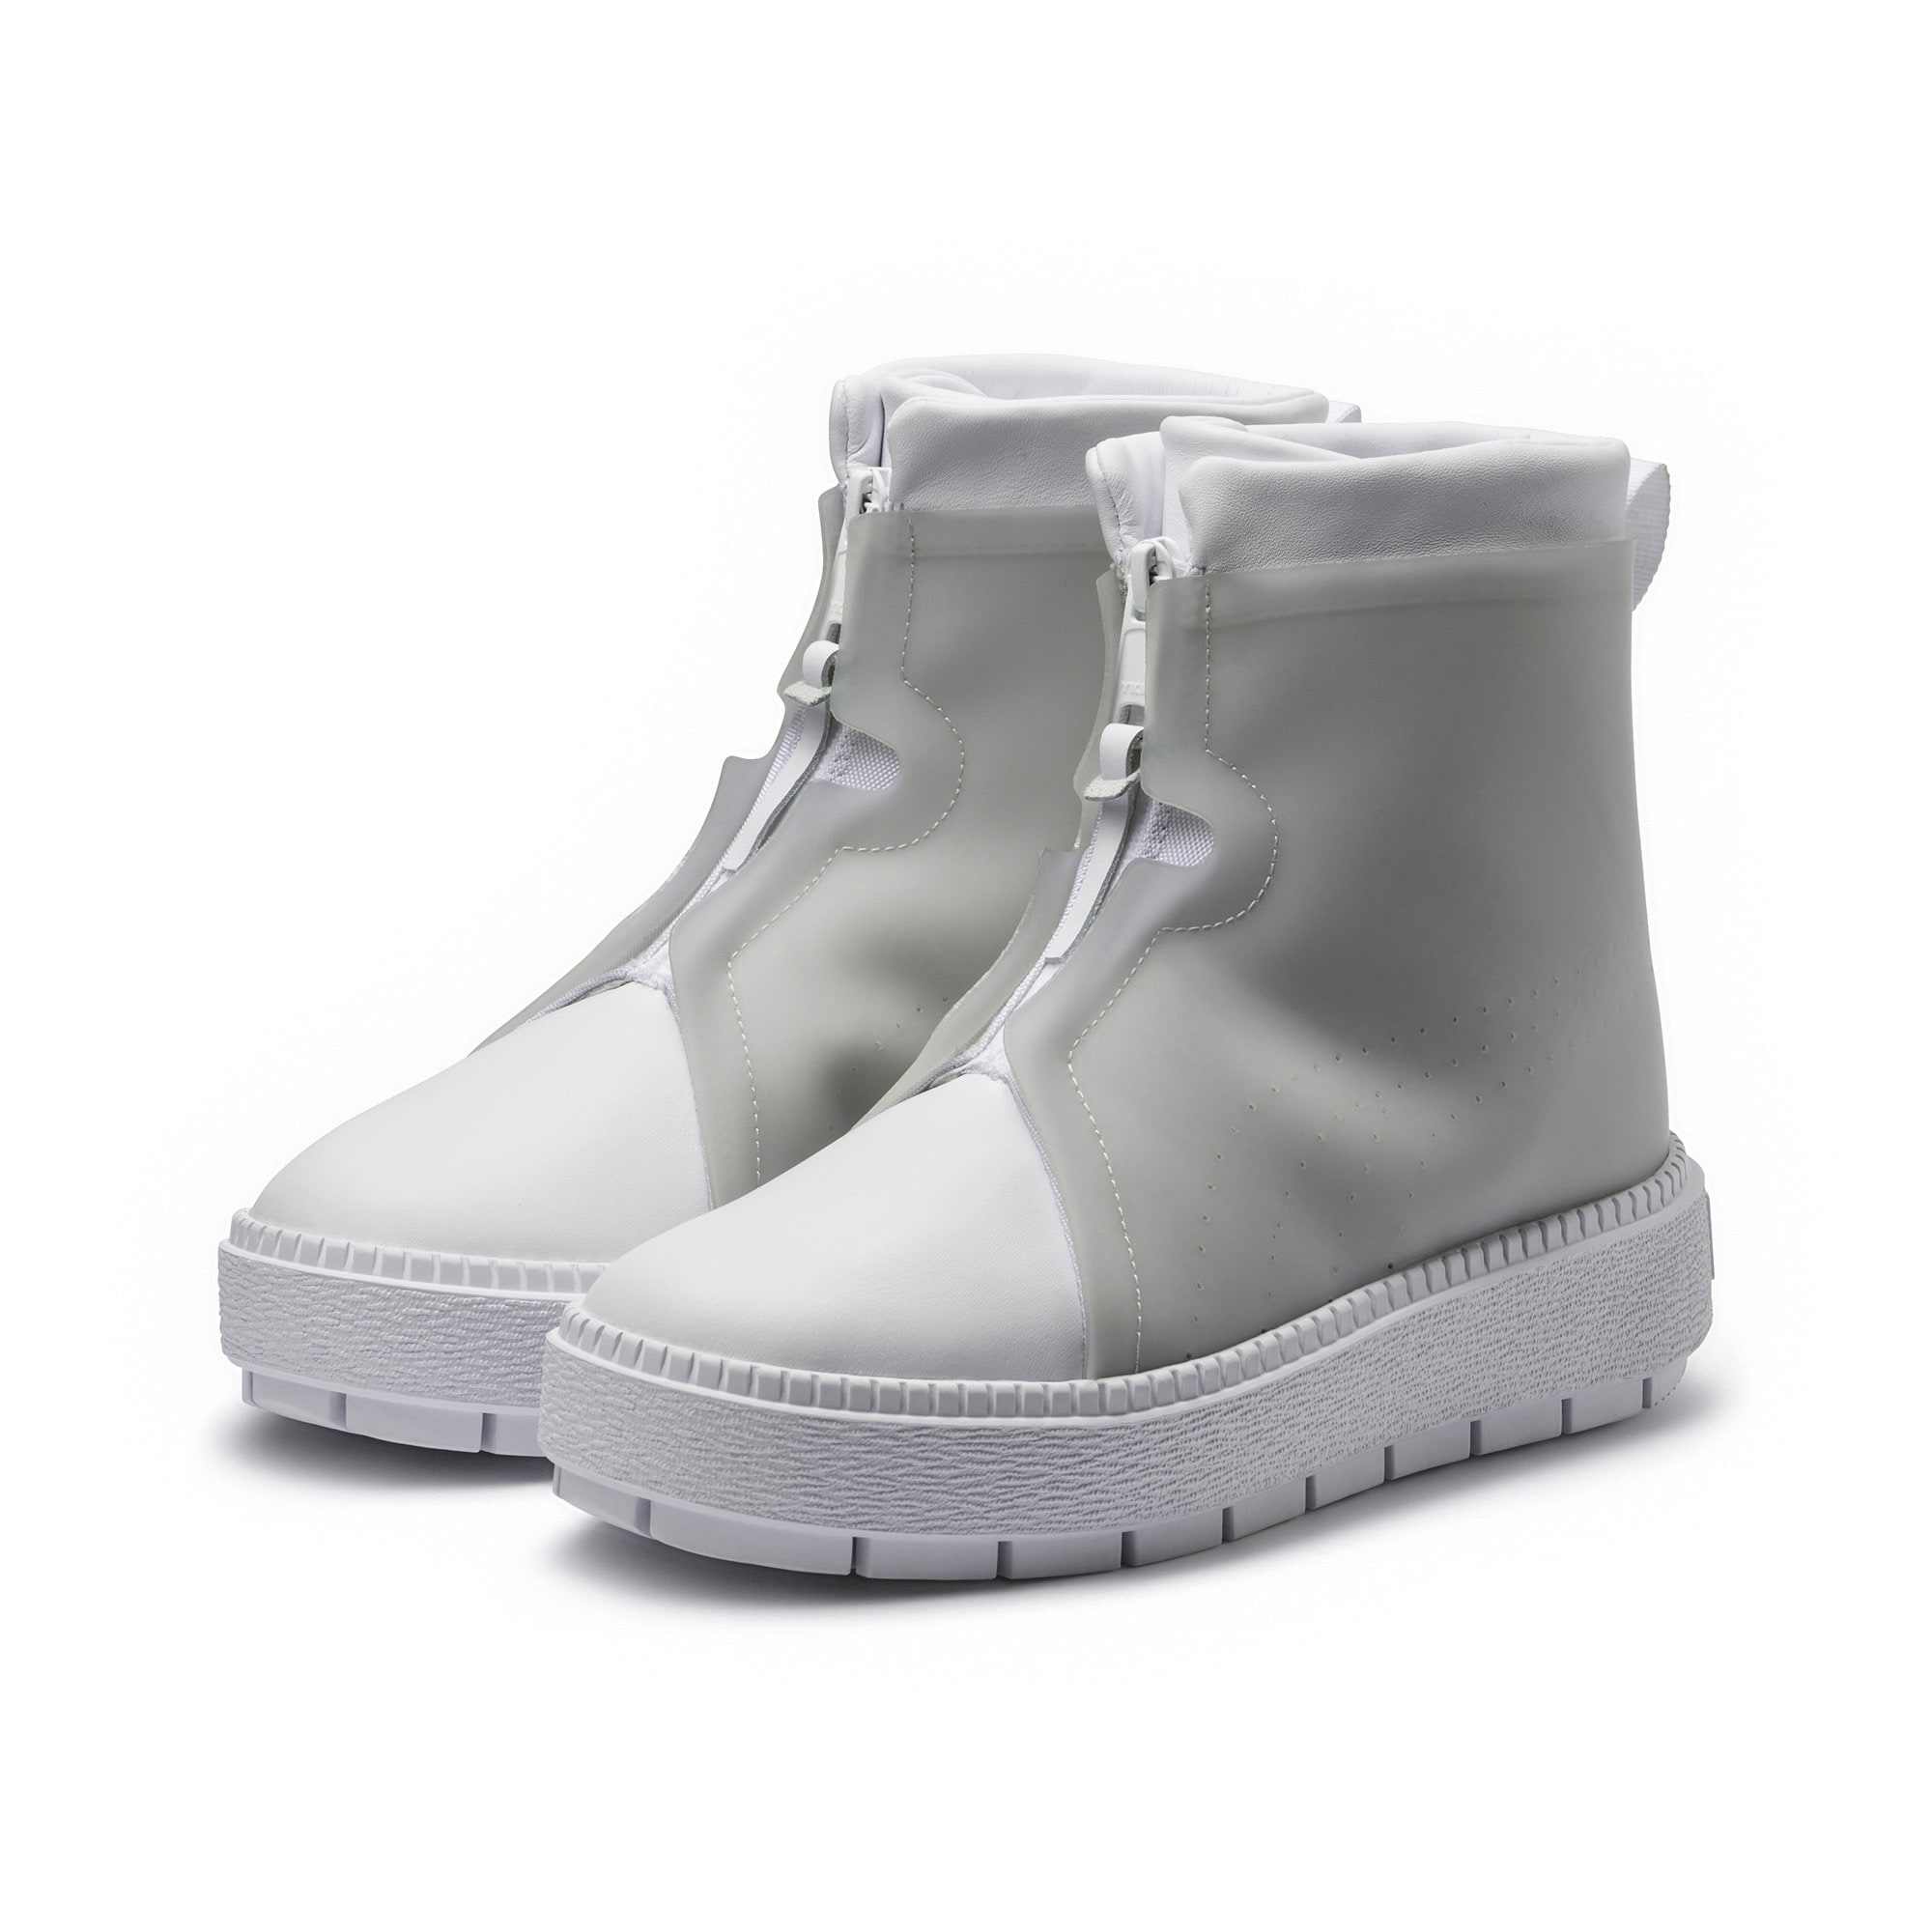 Thumbnail 2 of Platform Trace Women's Rain Boots, Puma White-Gray Violet, medium